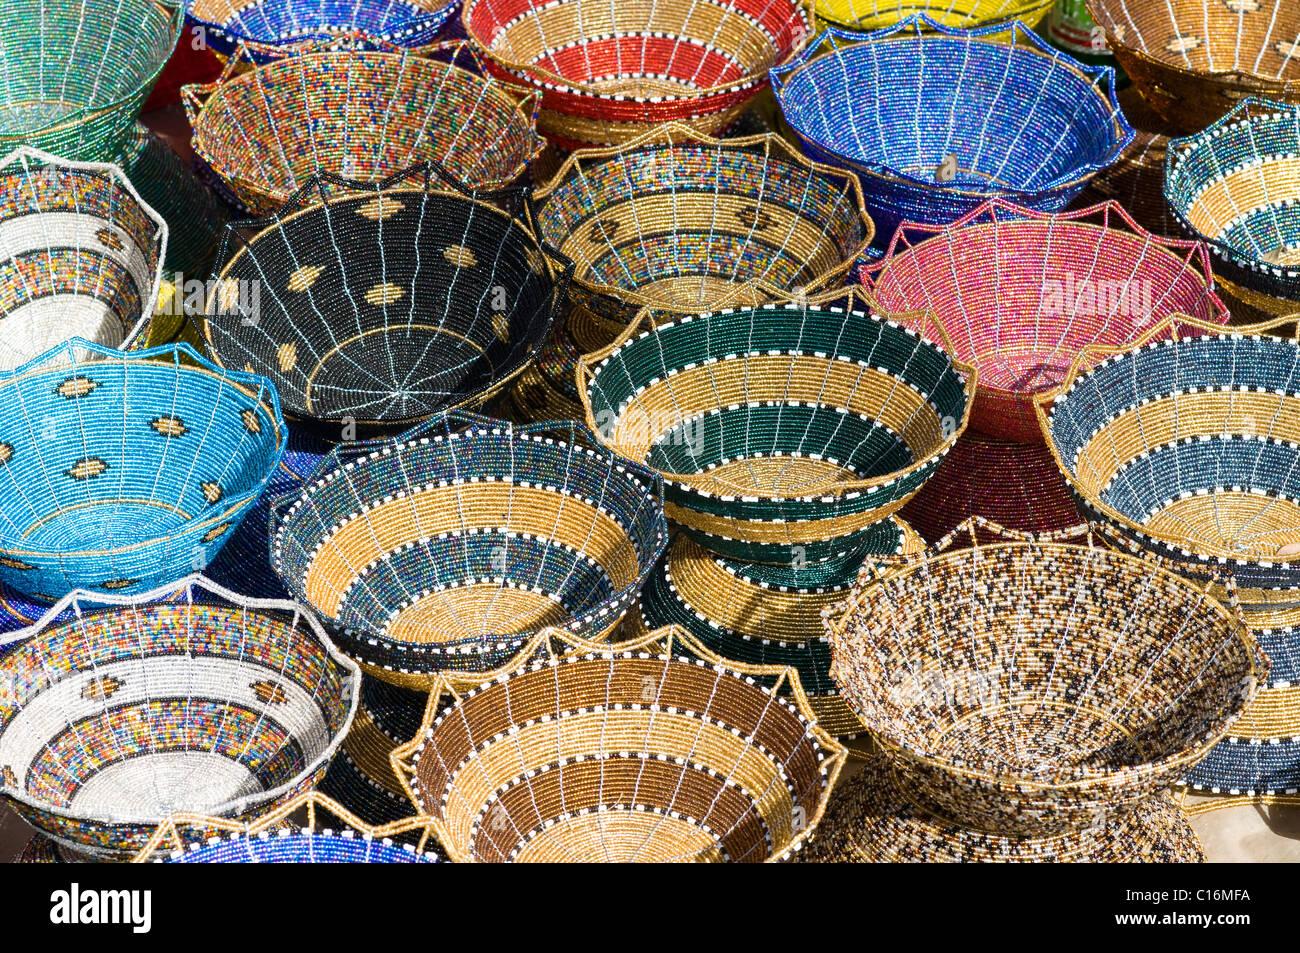 beaded baskets, Maasai Market, city centre - Stock Image